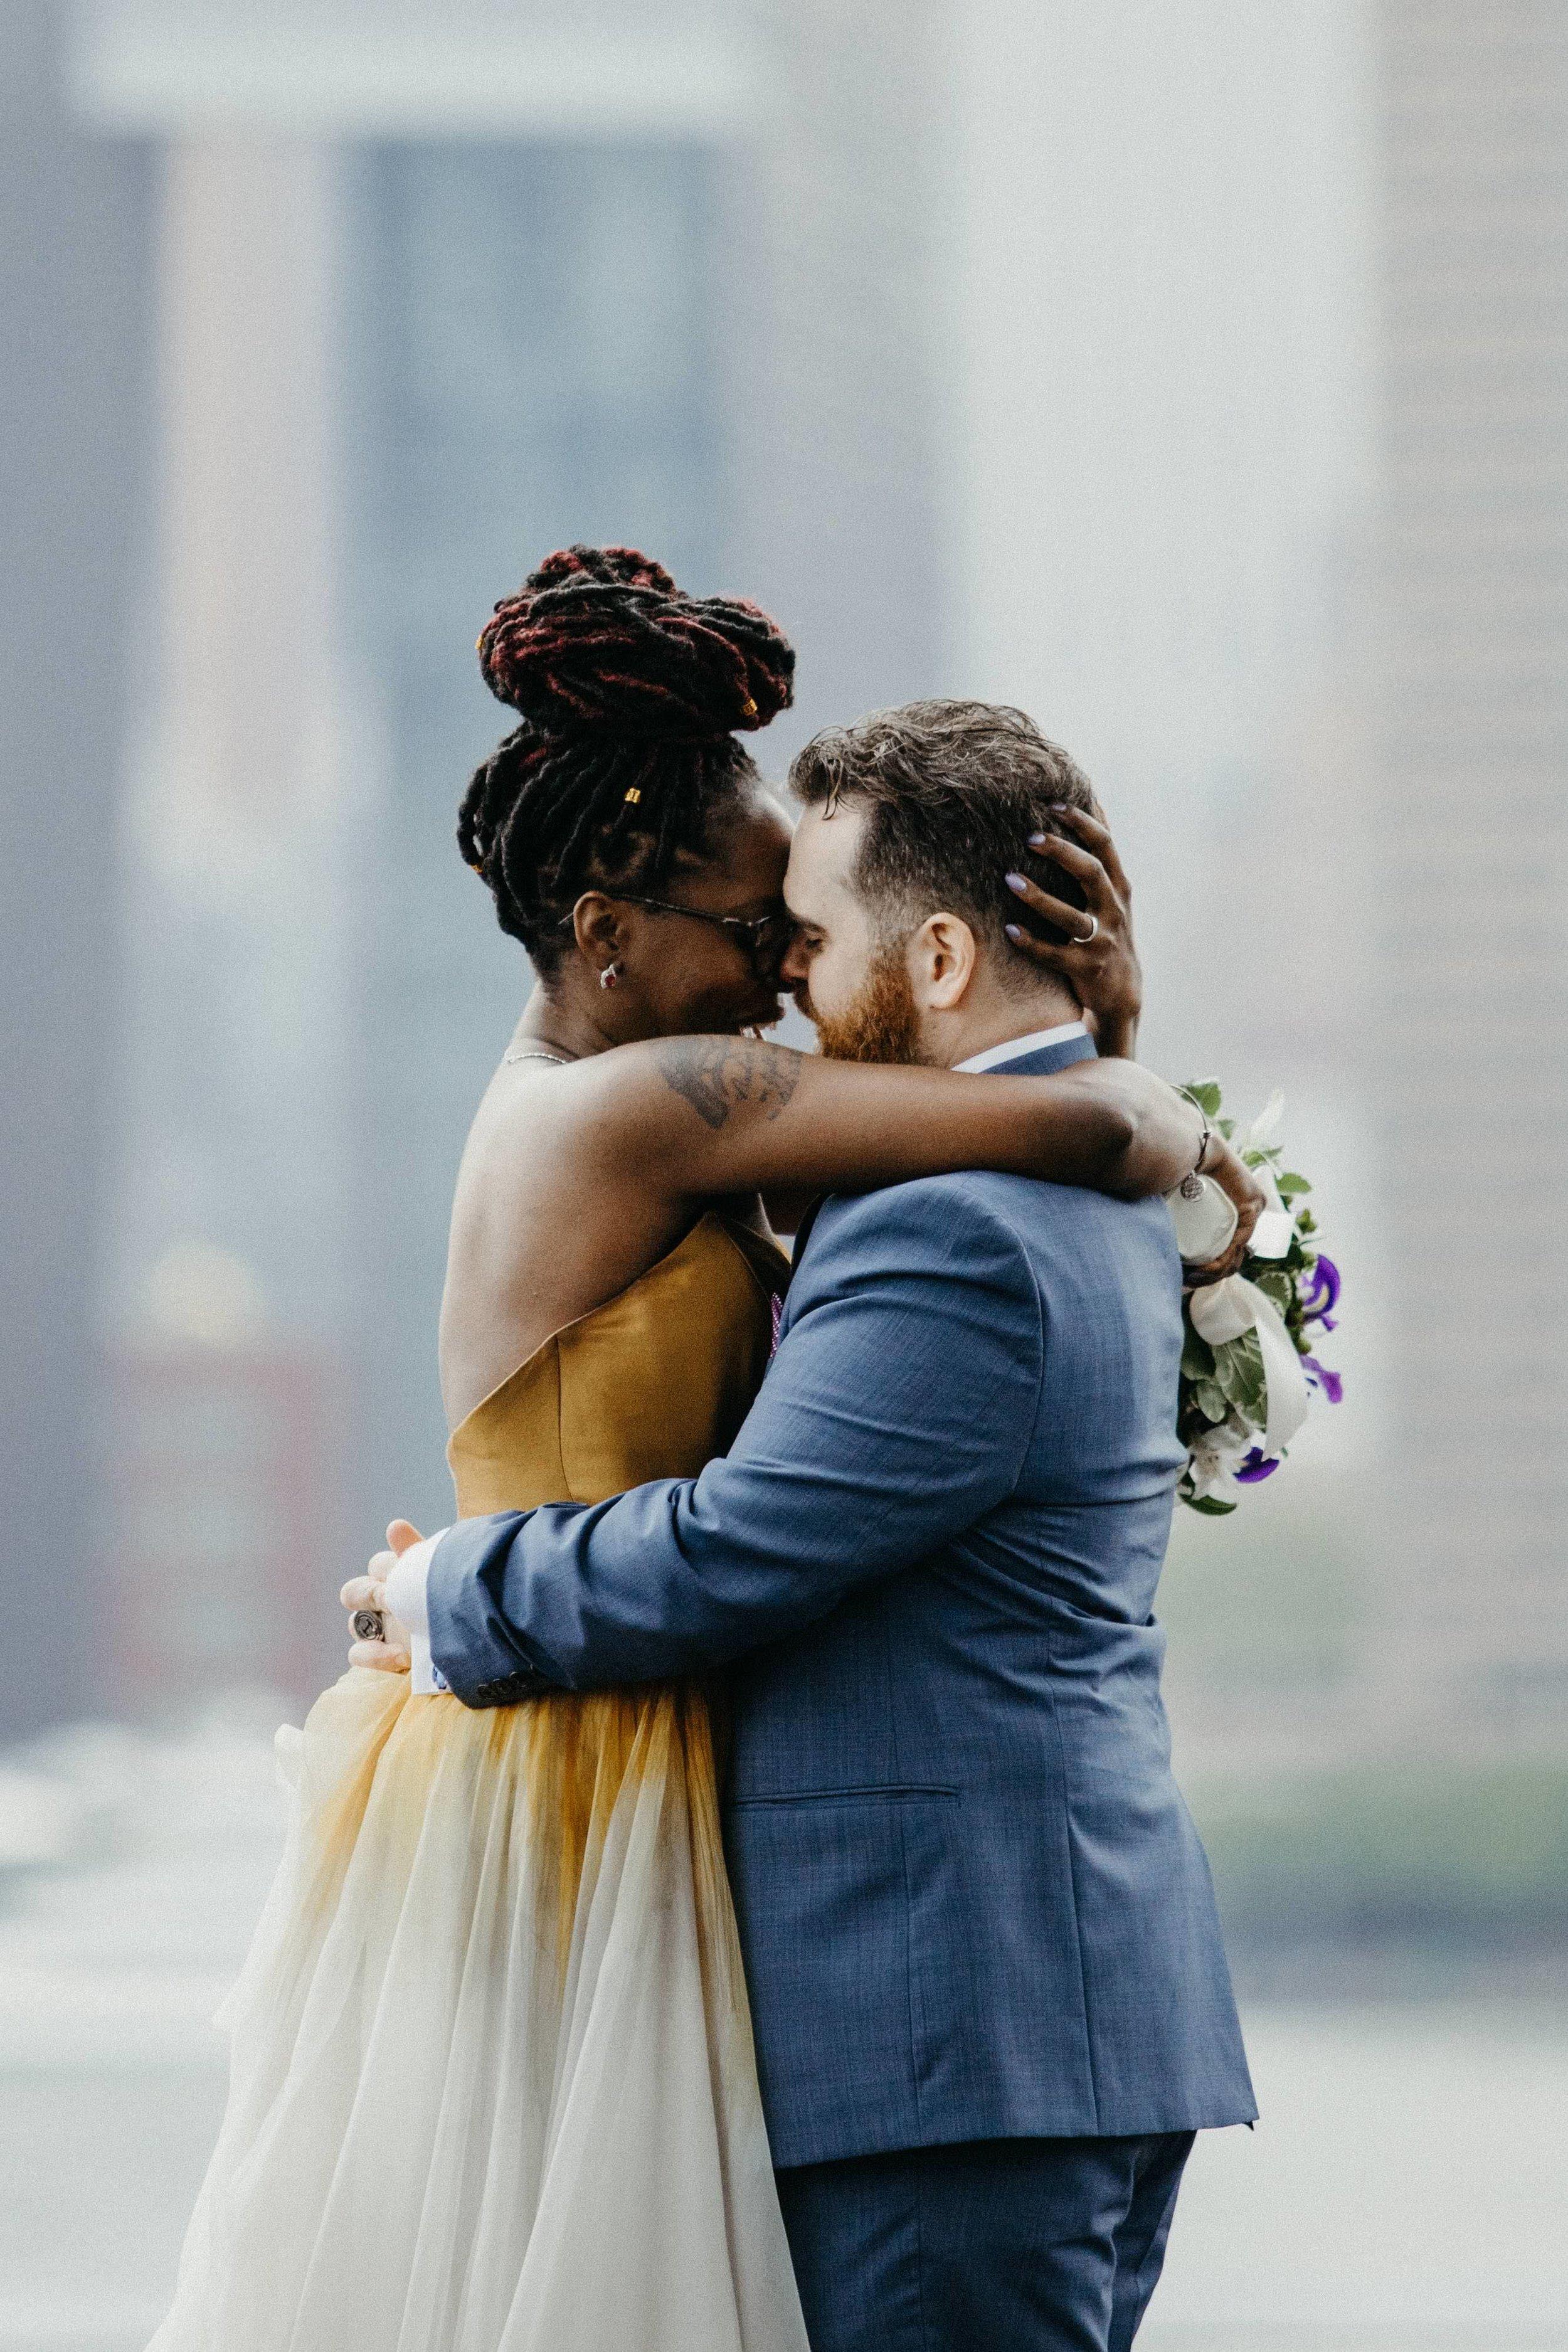 Sevlynn-Photography-Wedding-LIC-Landing-Maiella-NYC-44.jpg